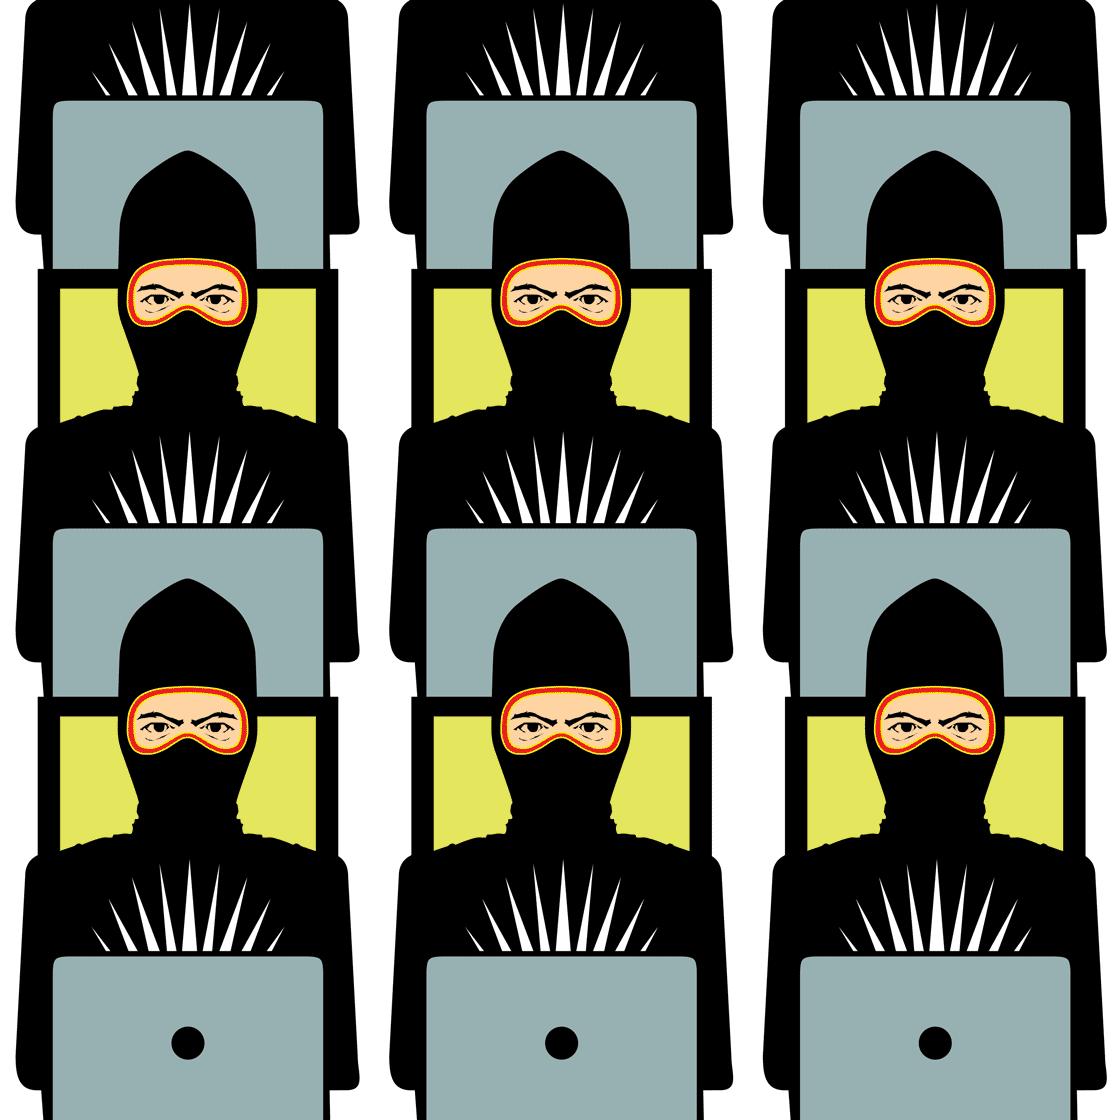 Fake new ninjas (illustration copyright 2019 by Pat Linse, Art Director of Skeptic Magazine. Illustration appears in Skeptic Magazine 24.1 in 2019)